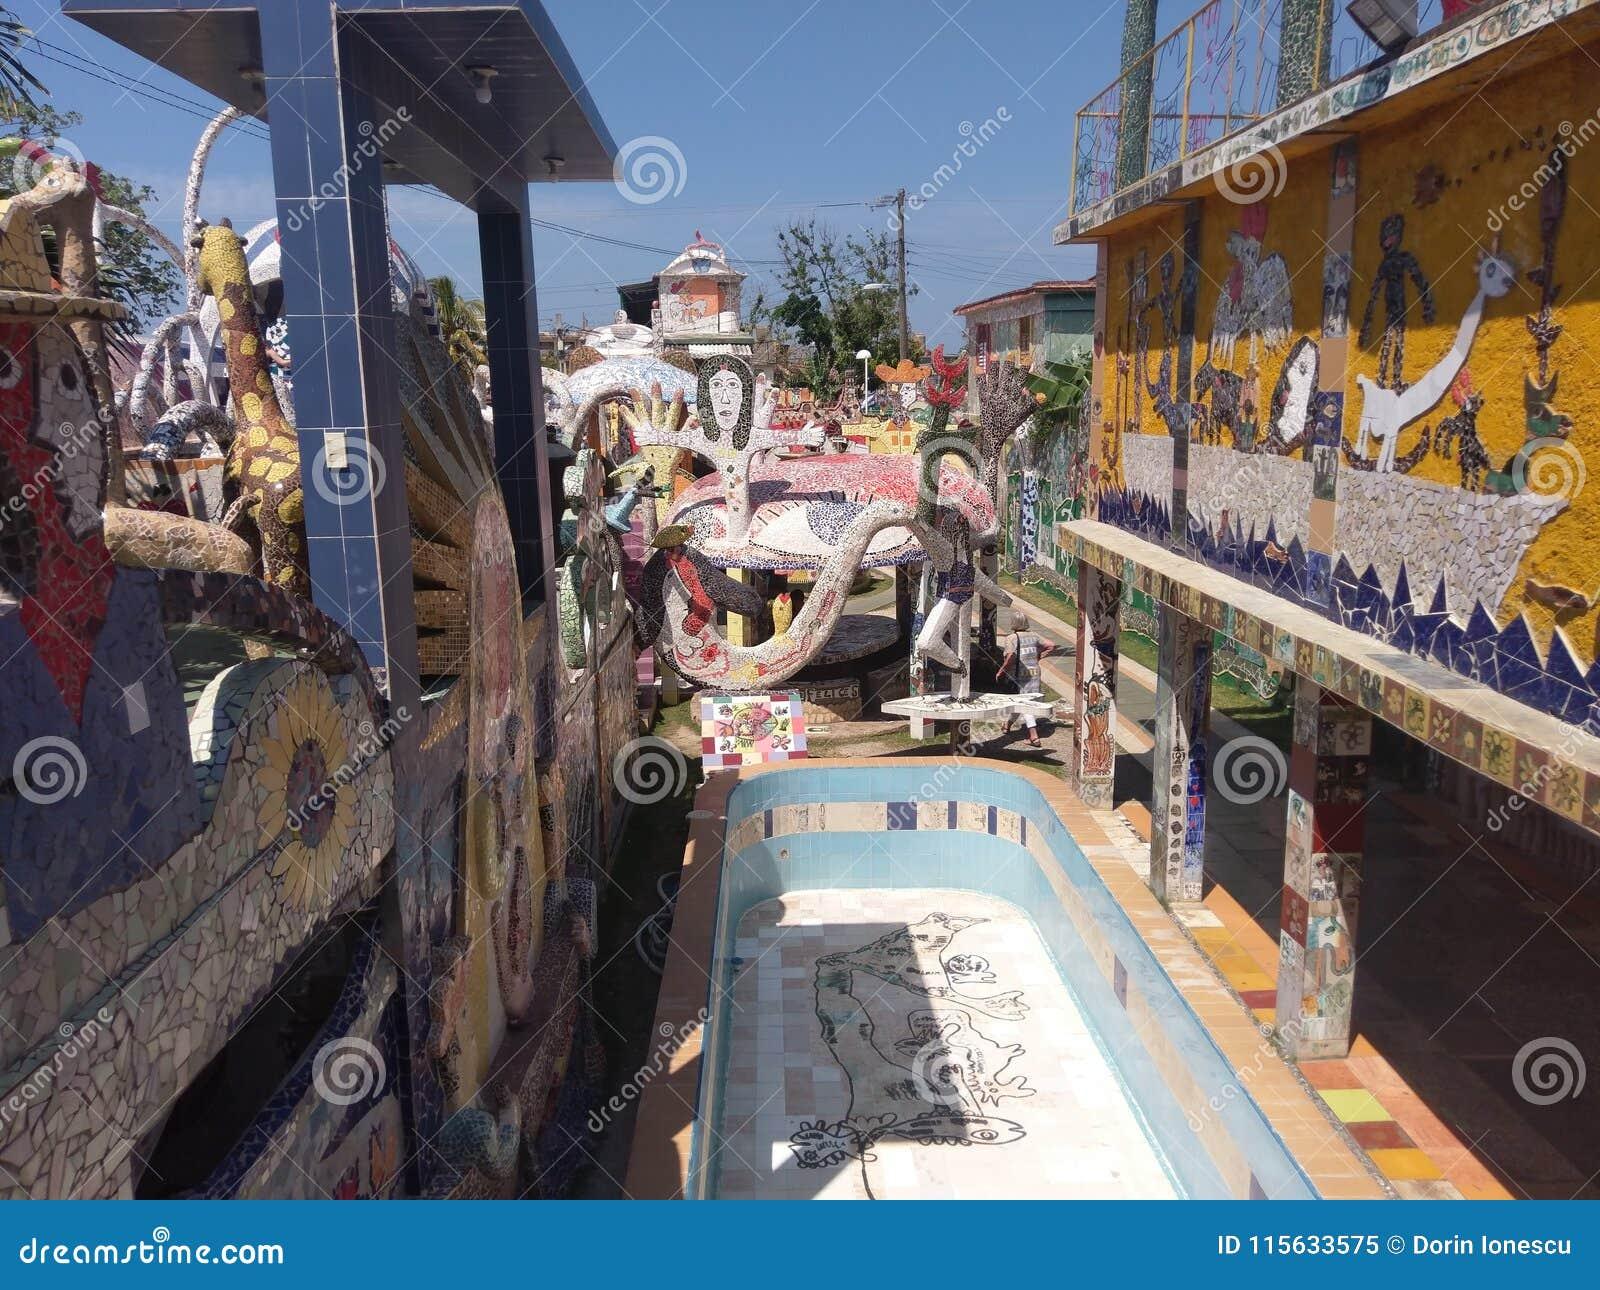 recreation, tourist attraction, mural, amusement park, tourism, bobsled, bobsleigh, bob, gondola